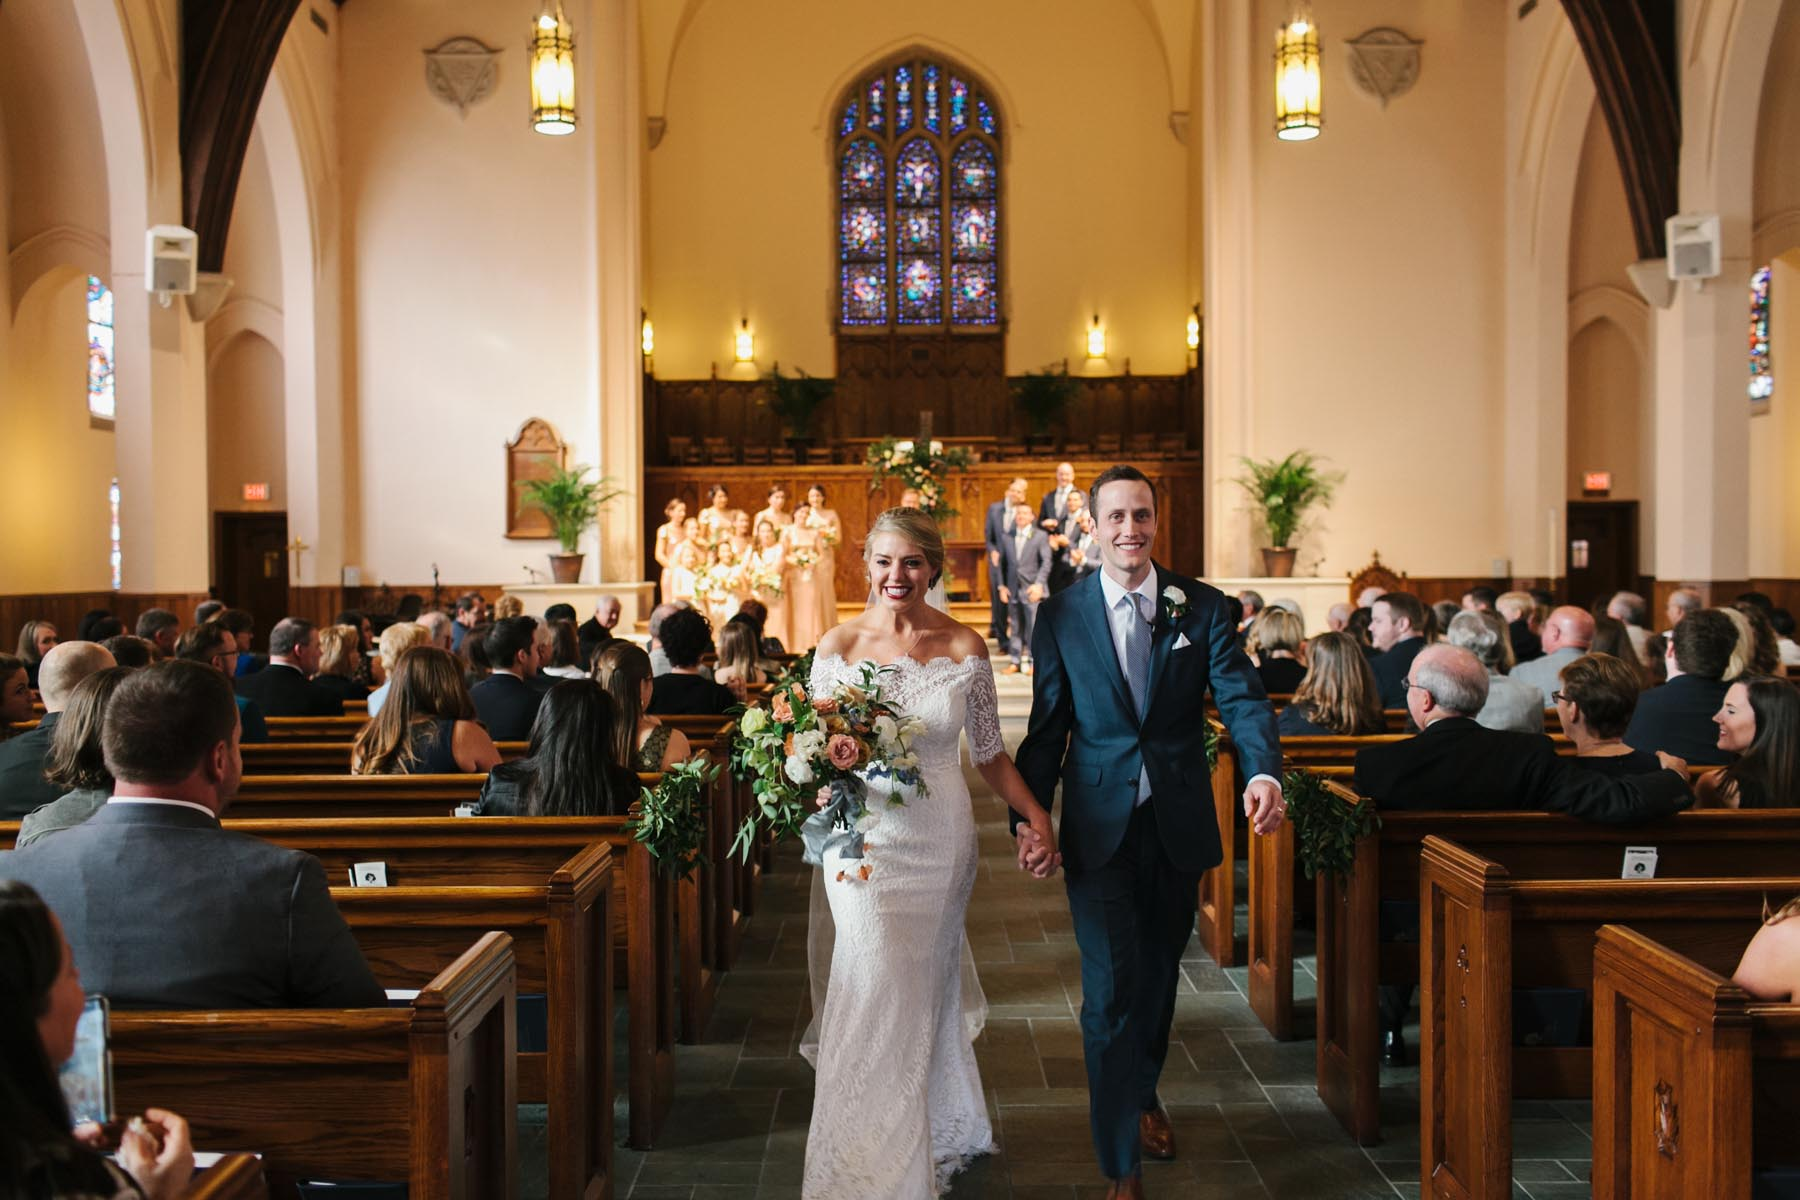 kjellman wedding blog biltmore wedding -85